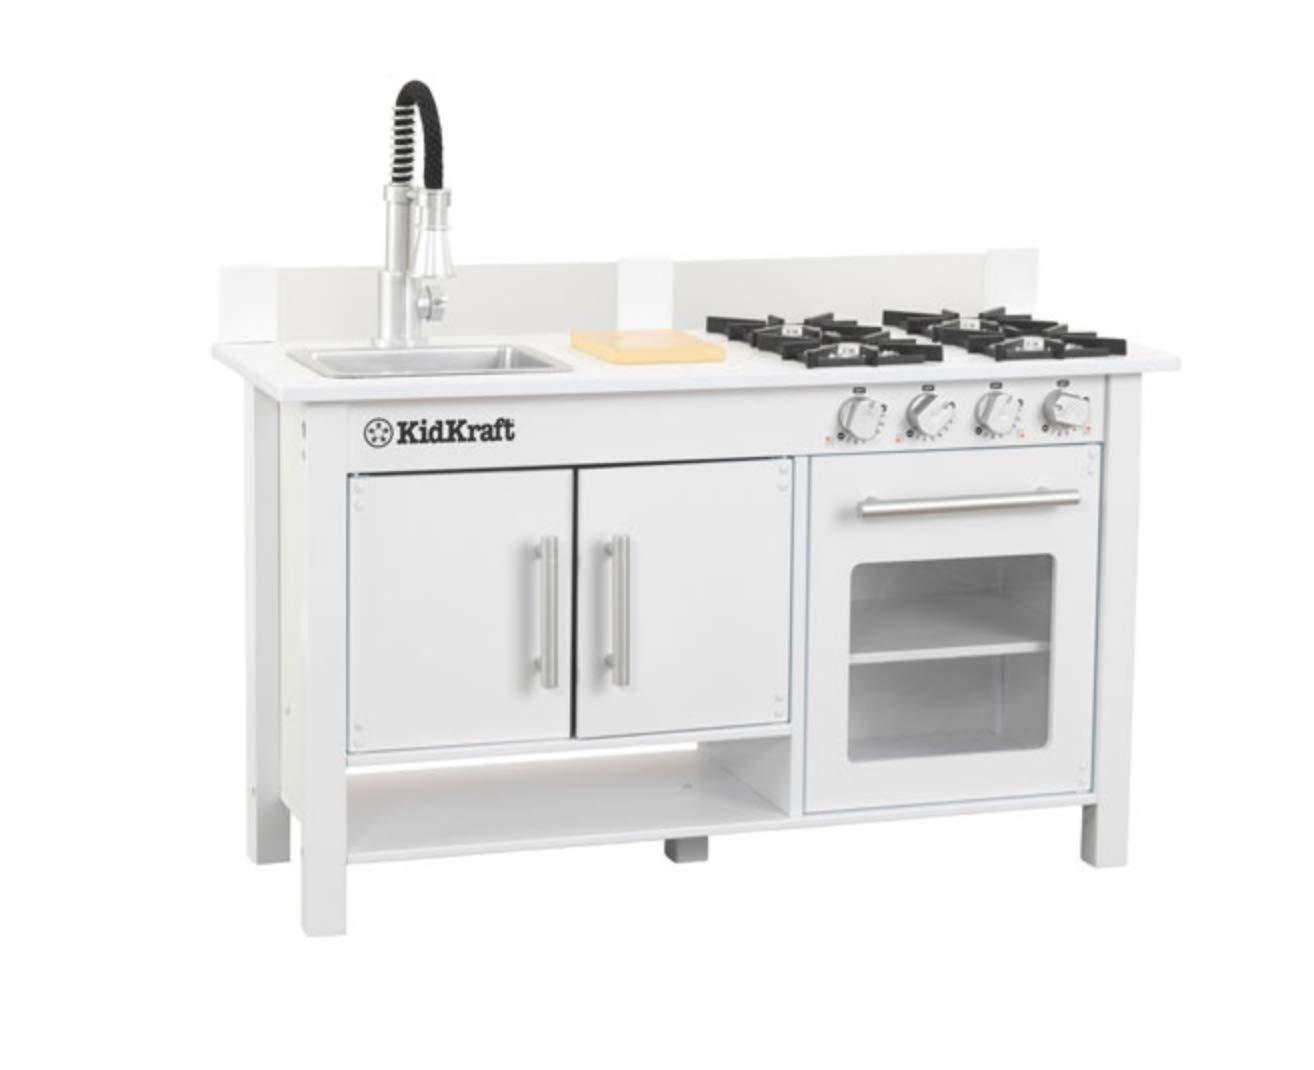 KidKraft Little Cook's Work Station Kitchen $74.38 - Amazon +Free Shipping *DOTD